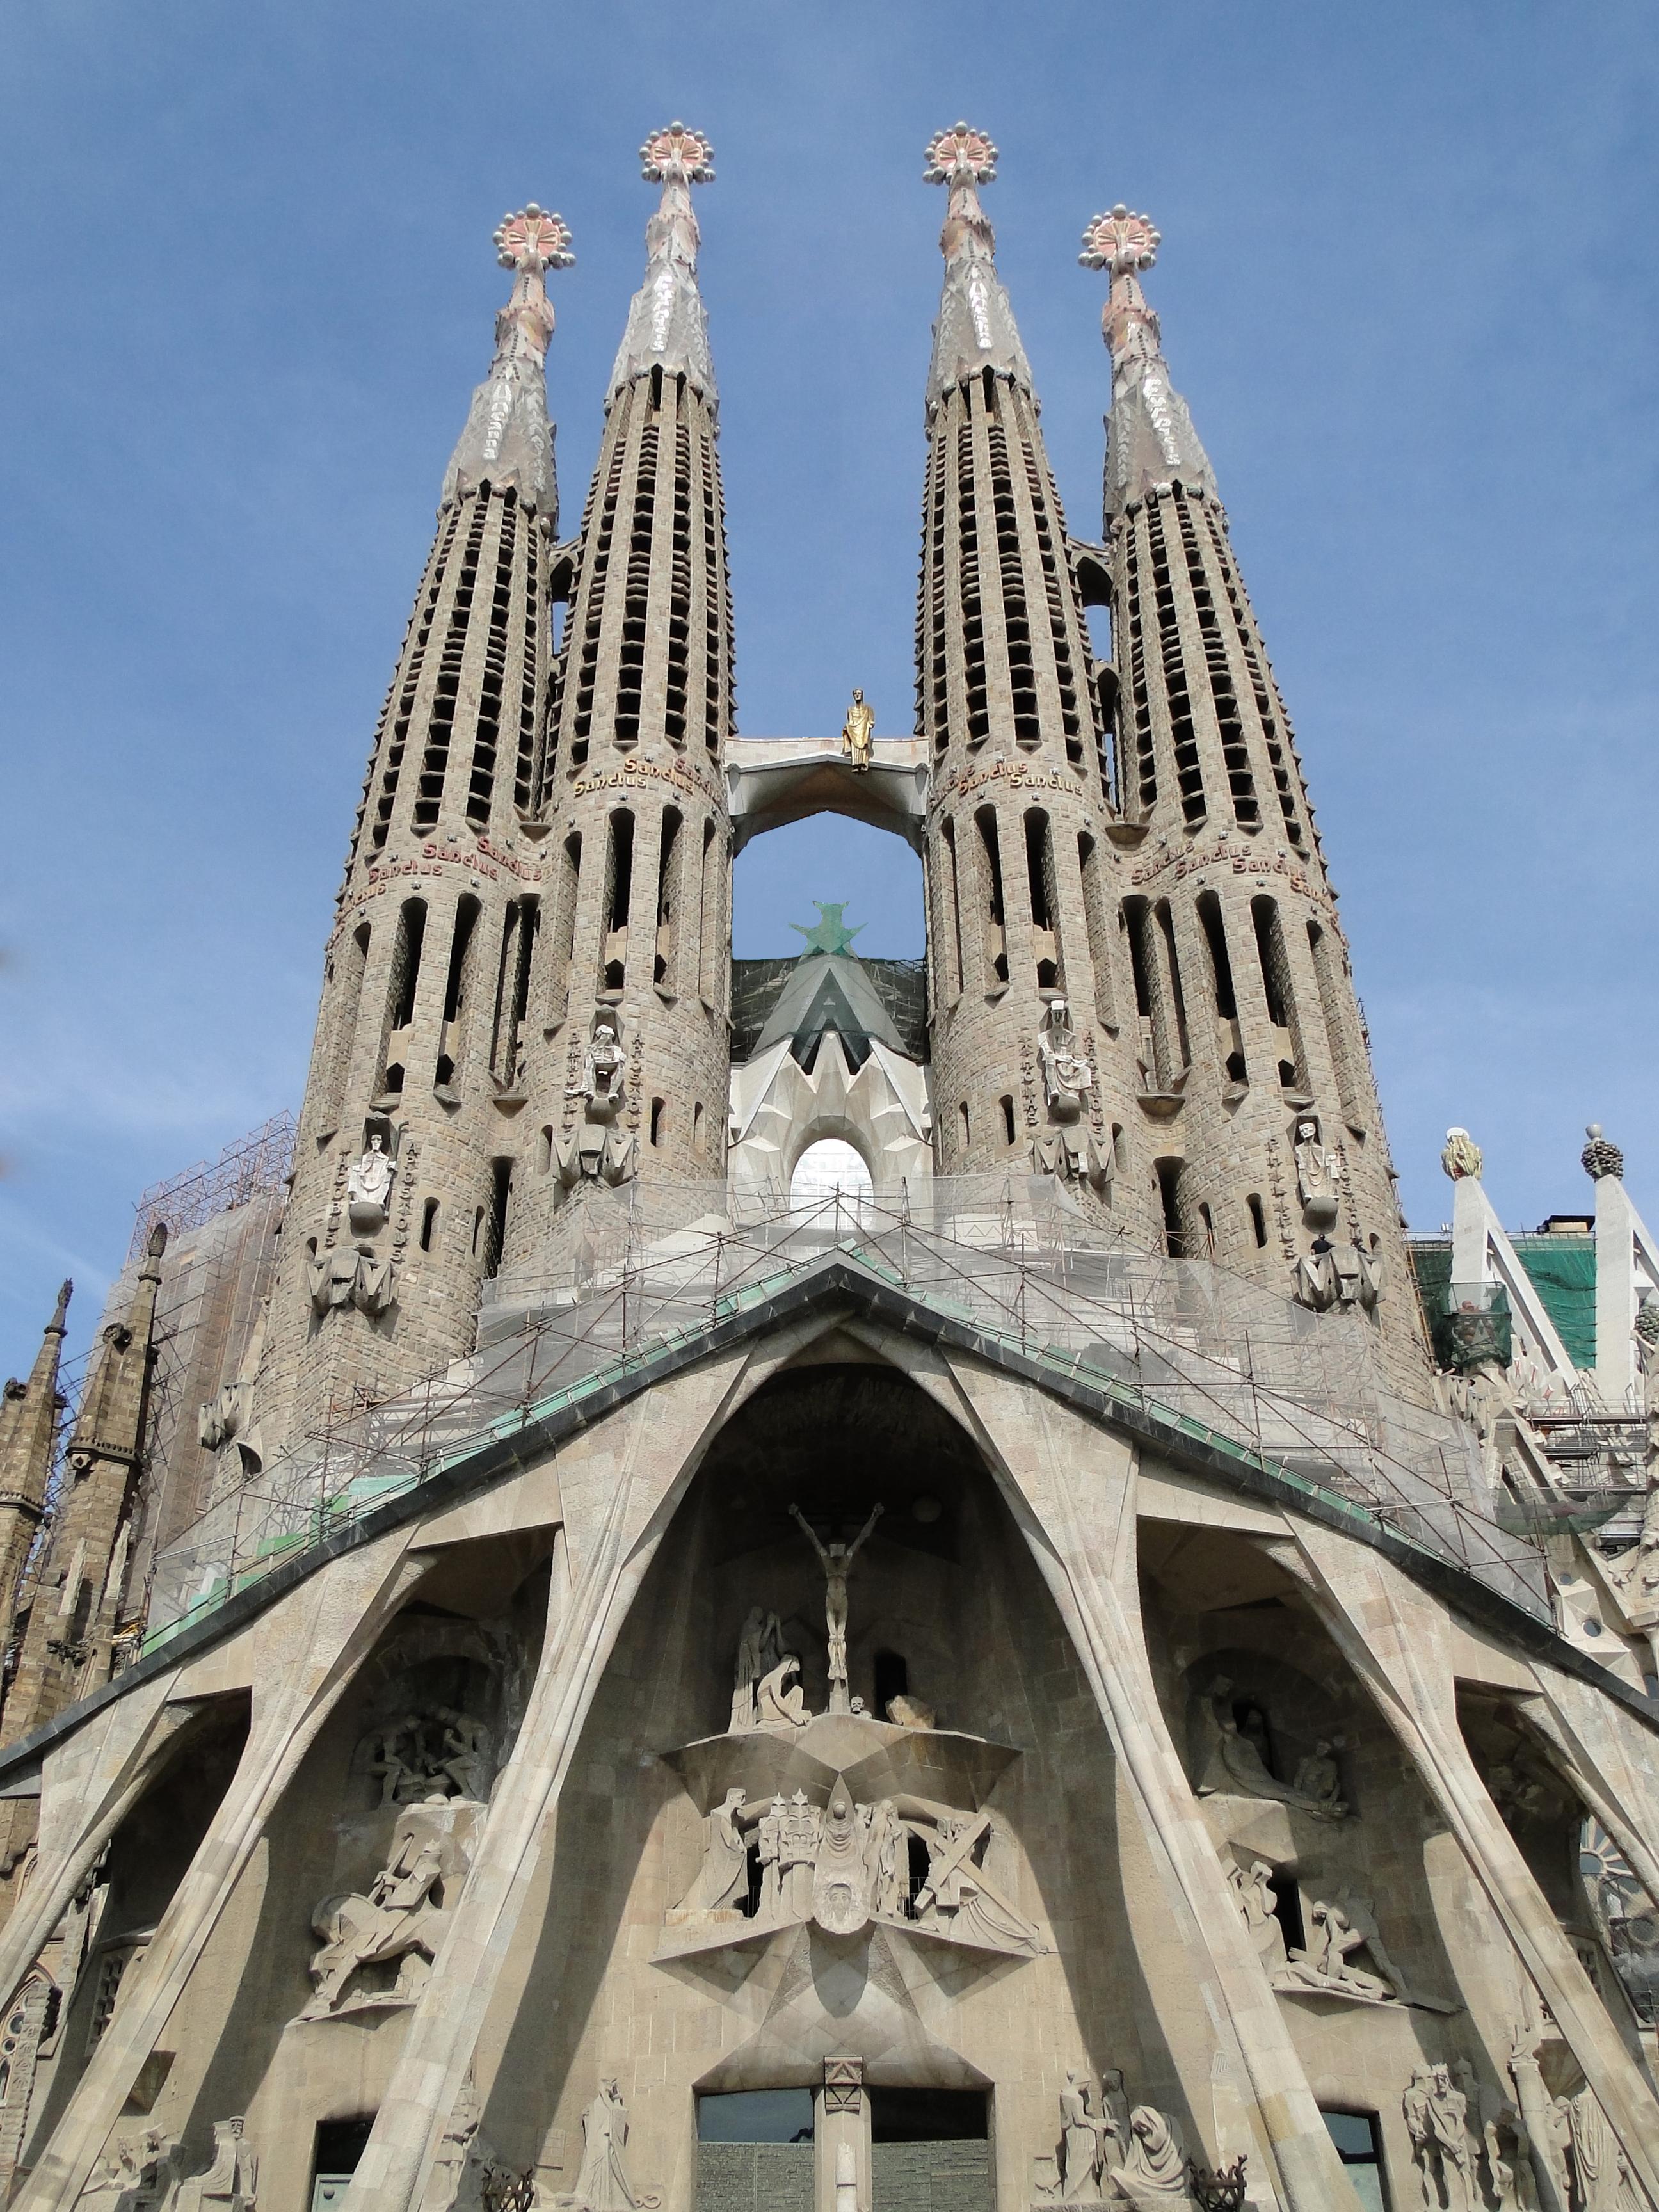 The Sagrada was designed by Gaudi